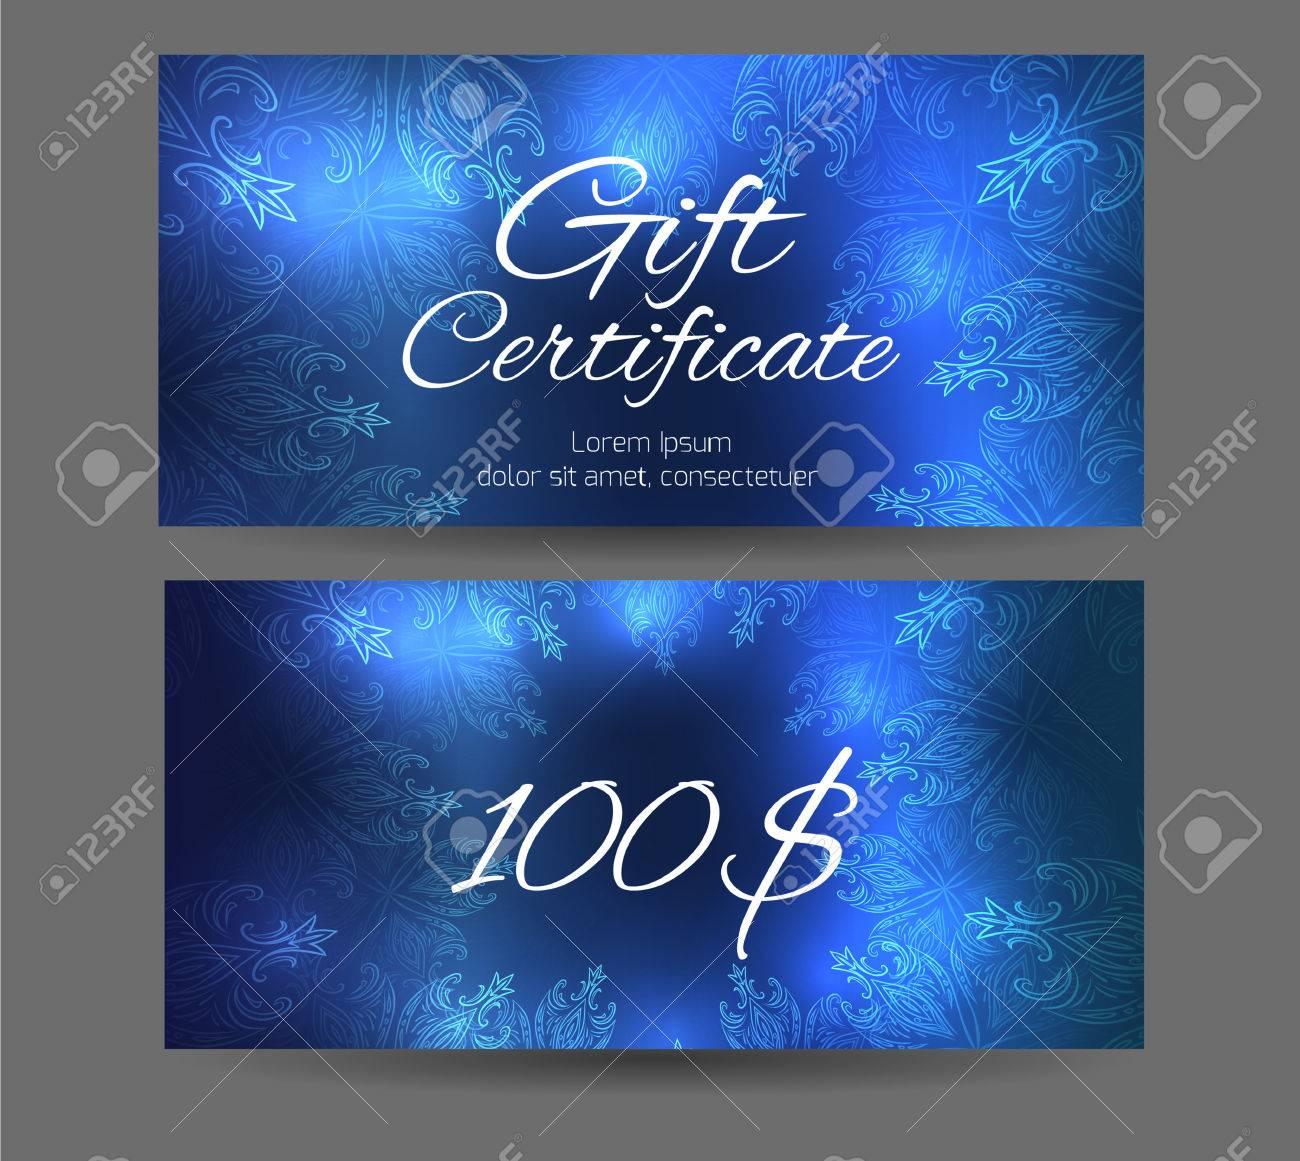 Template Gift Certificate For Yoga Studio Spa Center Massage Parlor Beauty Salon